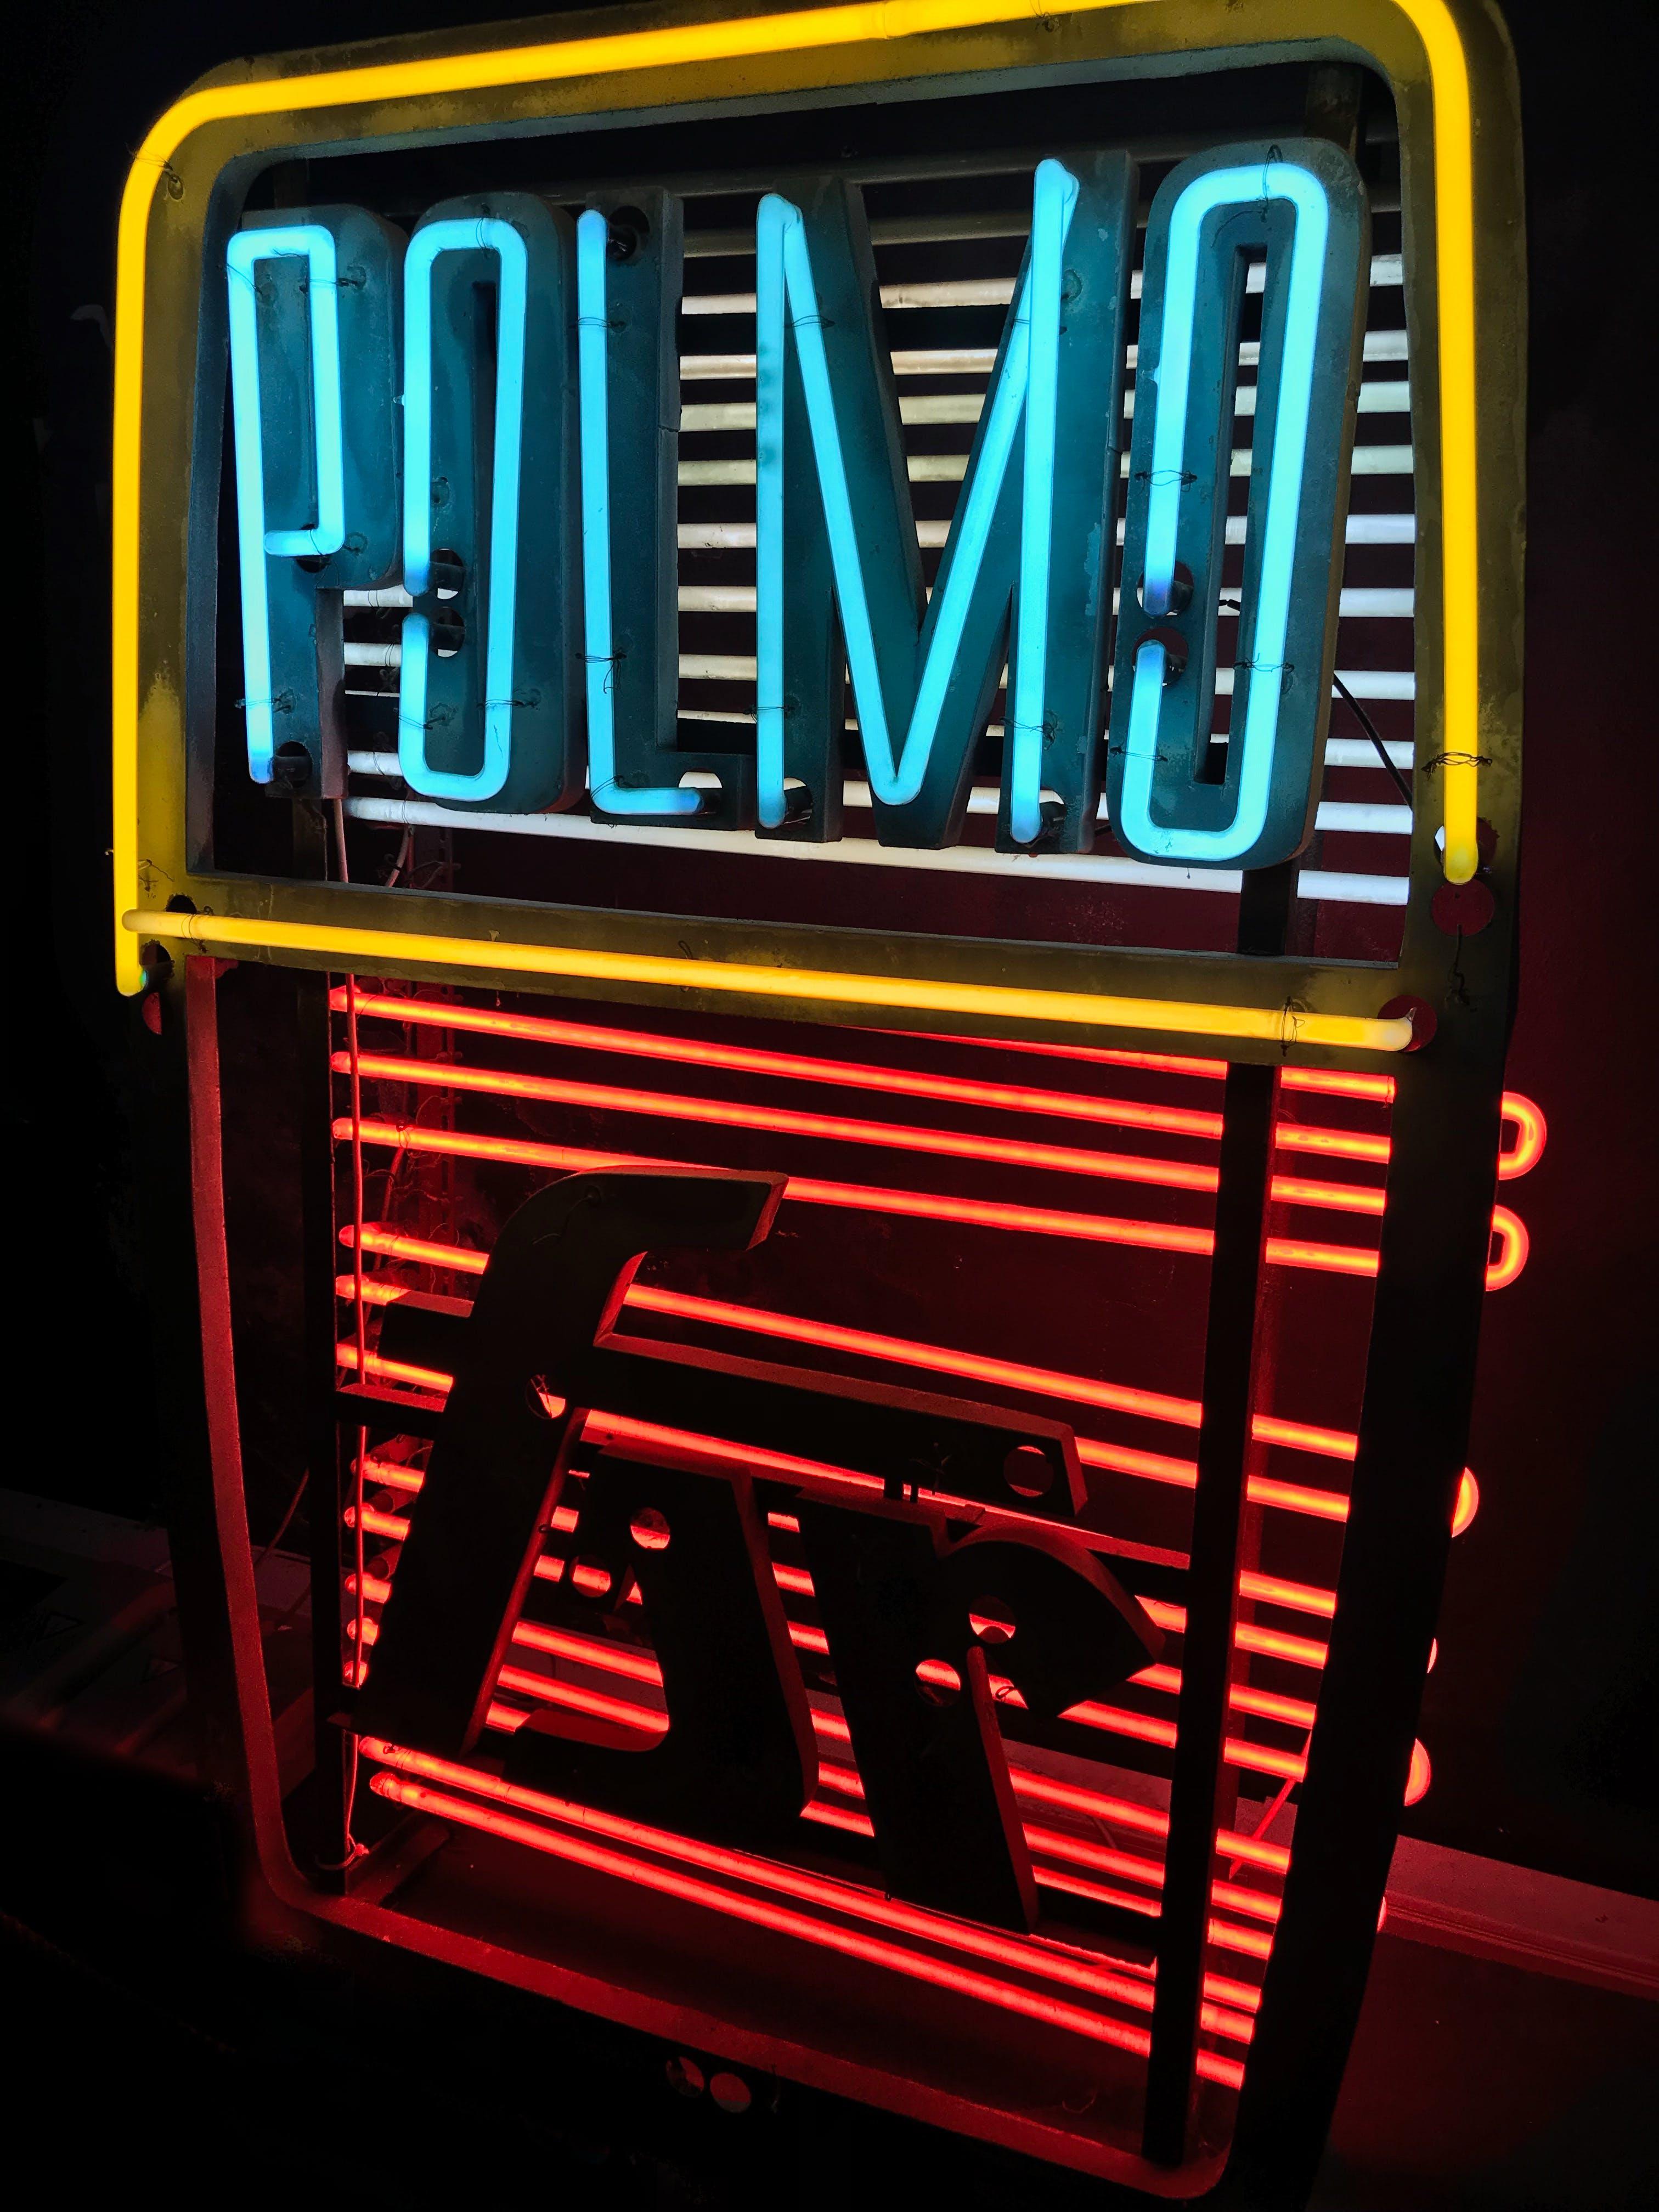 Free stock photo of neon, neon lights, Neon muzeum, neon sign